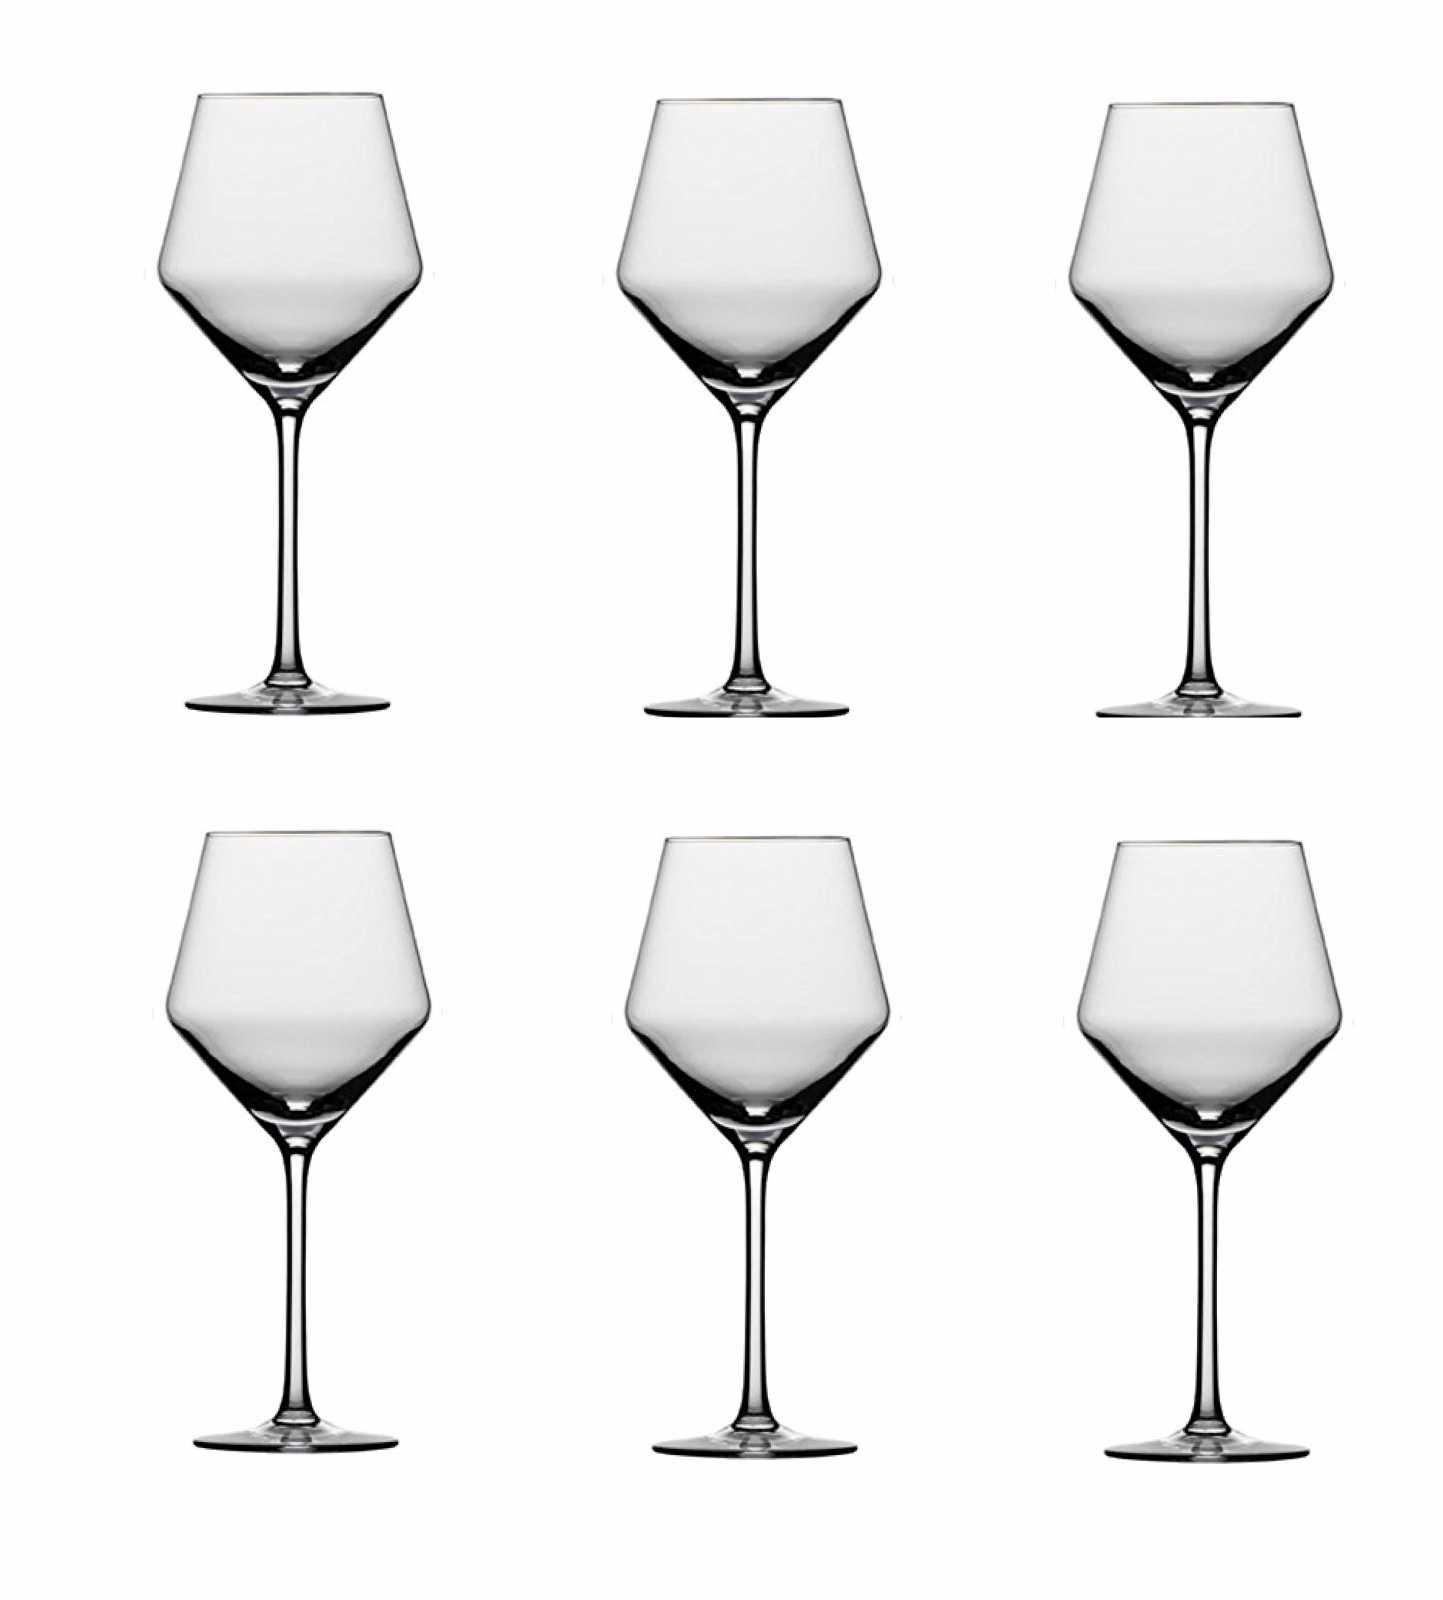 Онлайн каталог PROMENU: Набор бокалов для красного вина Schott Zwiesel PURE, объем 0,465 л, прозрачный, 6 штук Schott Zwiesel 112422_6шт